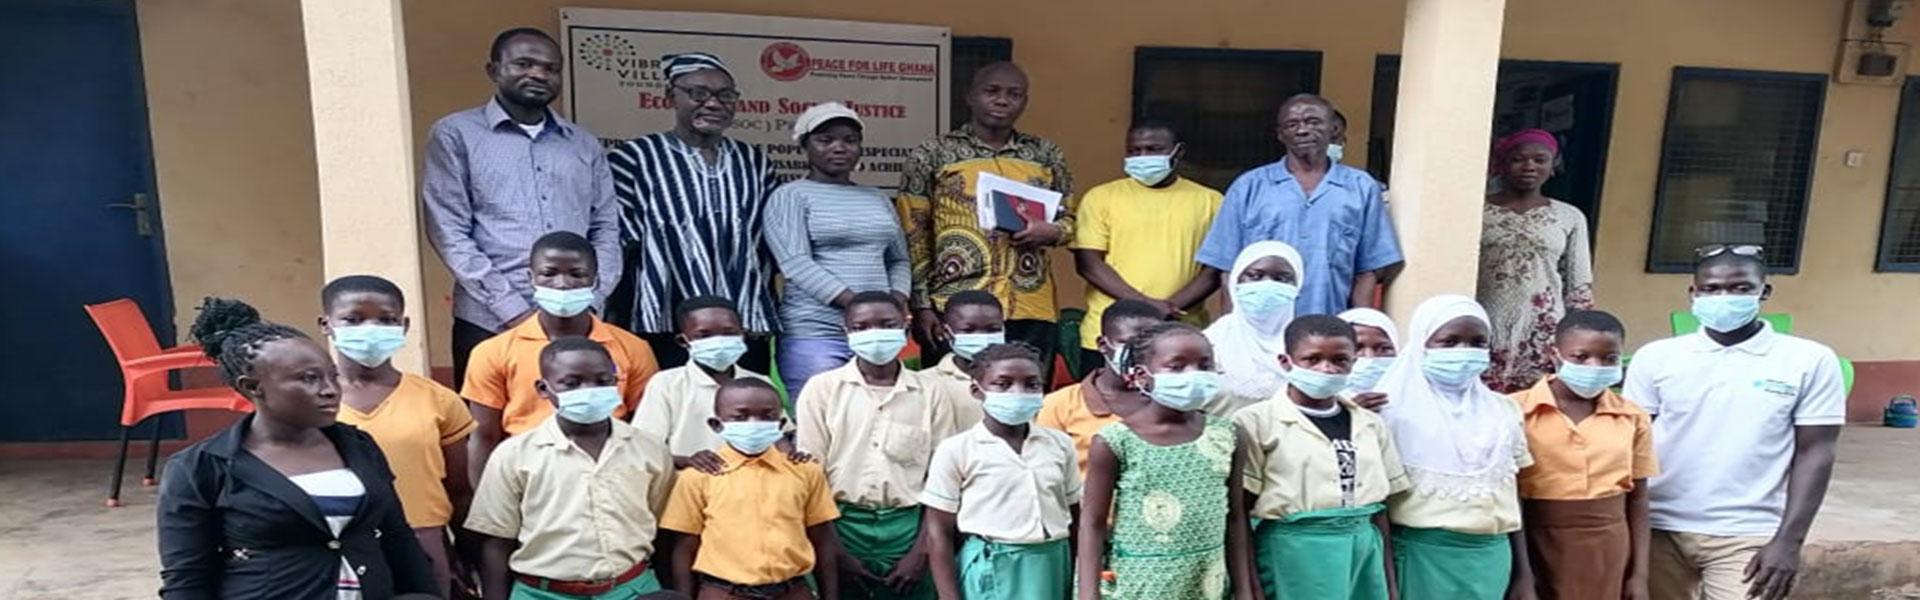 4-Day Capacity Building Training for School Health Clubs & Teachers on Health Promotion